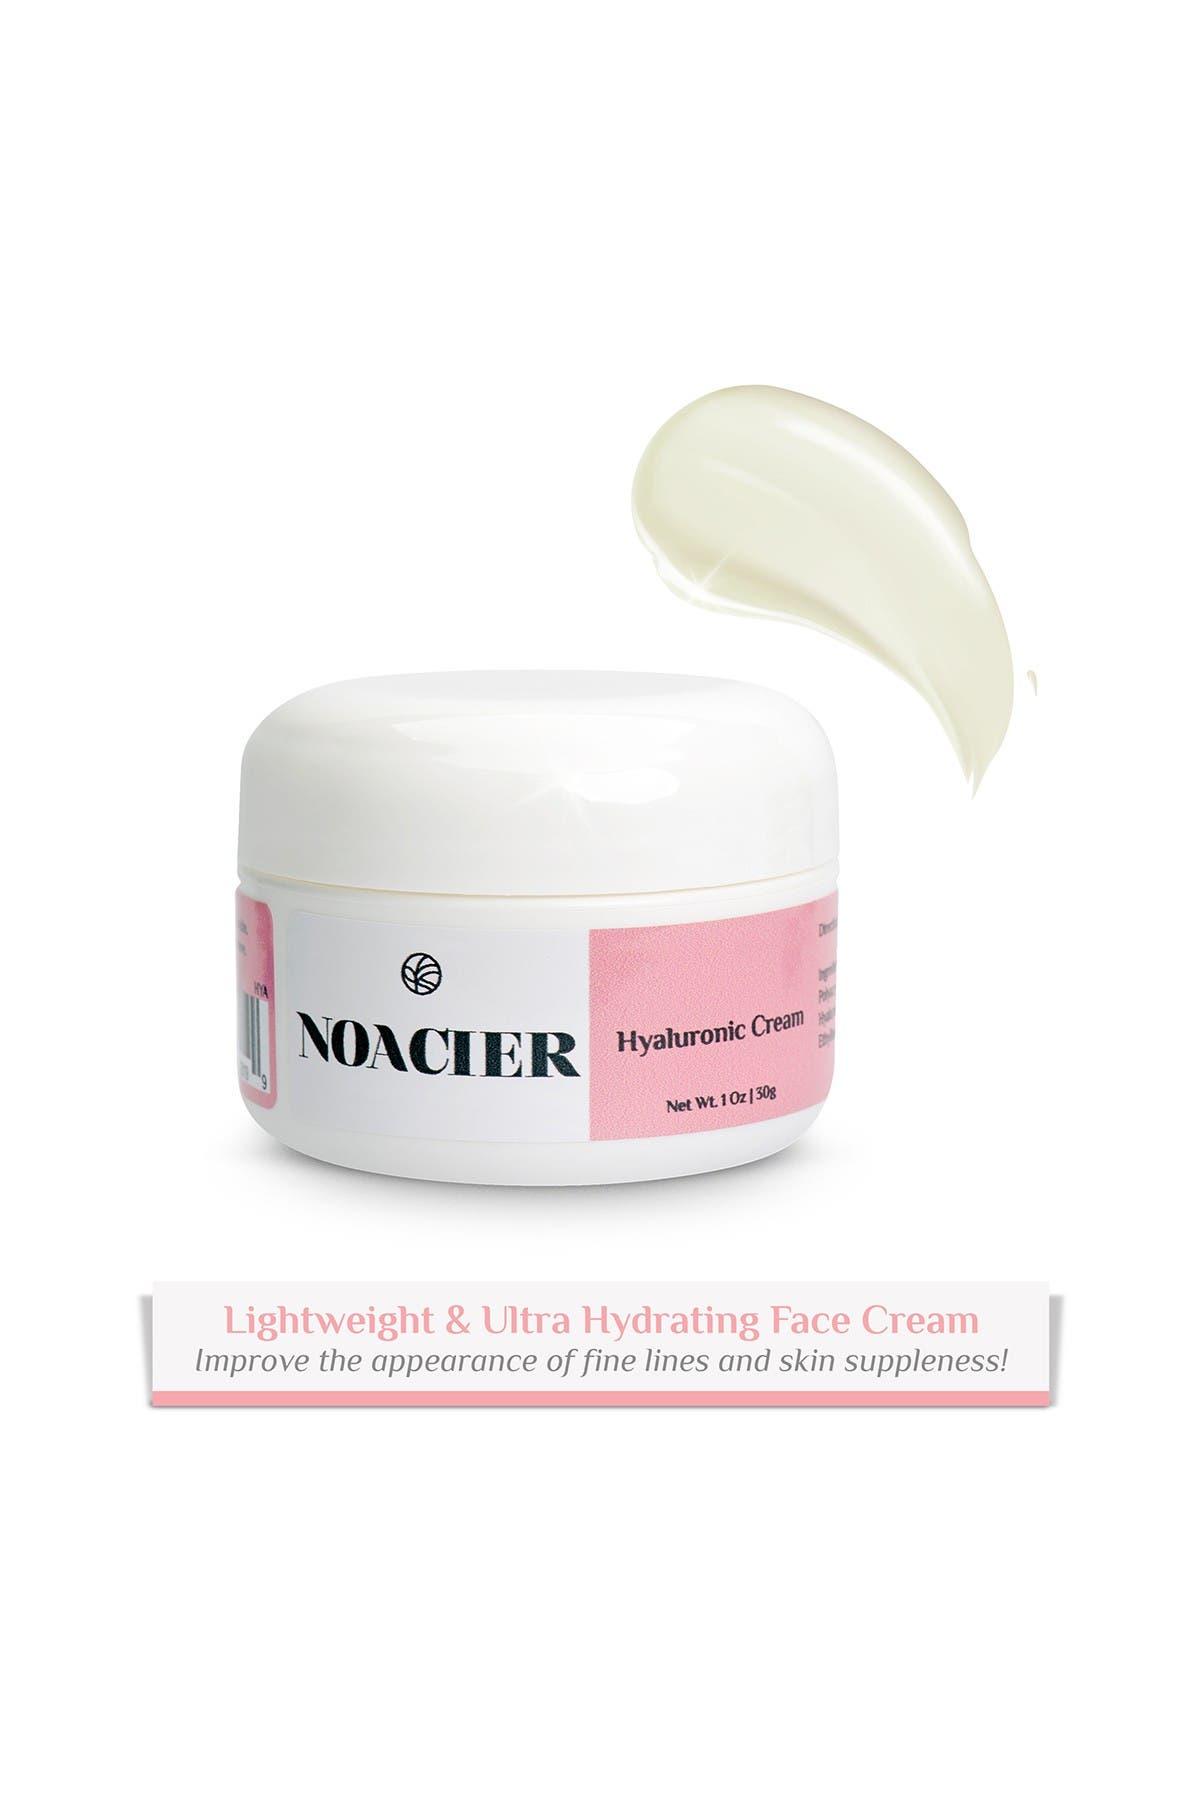 Image of Noacier Hyaluronic Acid Face Cream, Anti-Aging, Wrinkle Free, Ultra-Hydrating Moisturizing Facial Cream